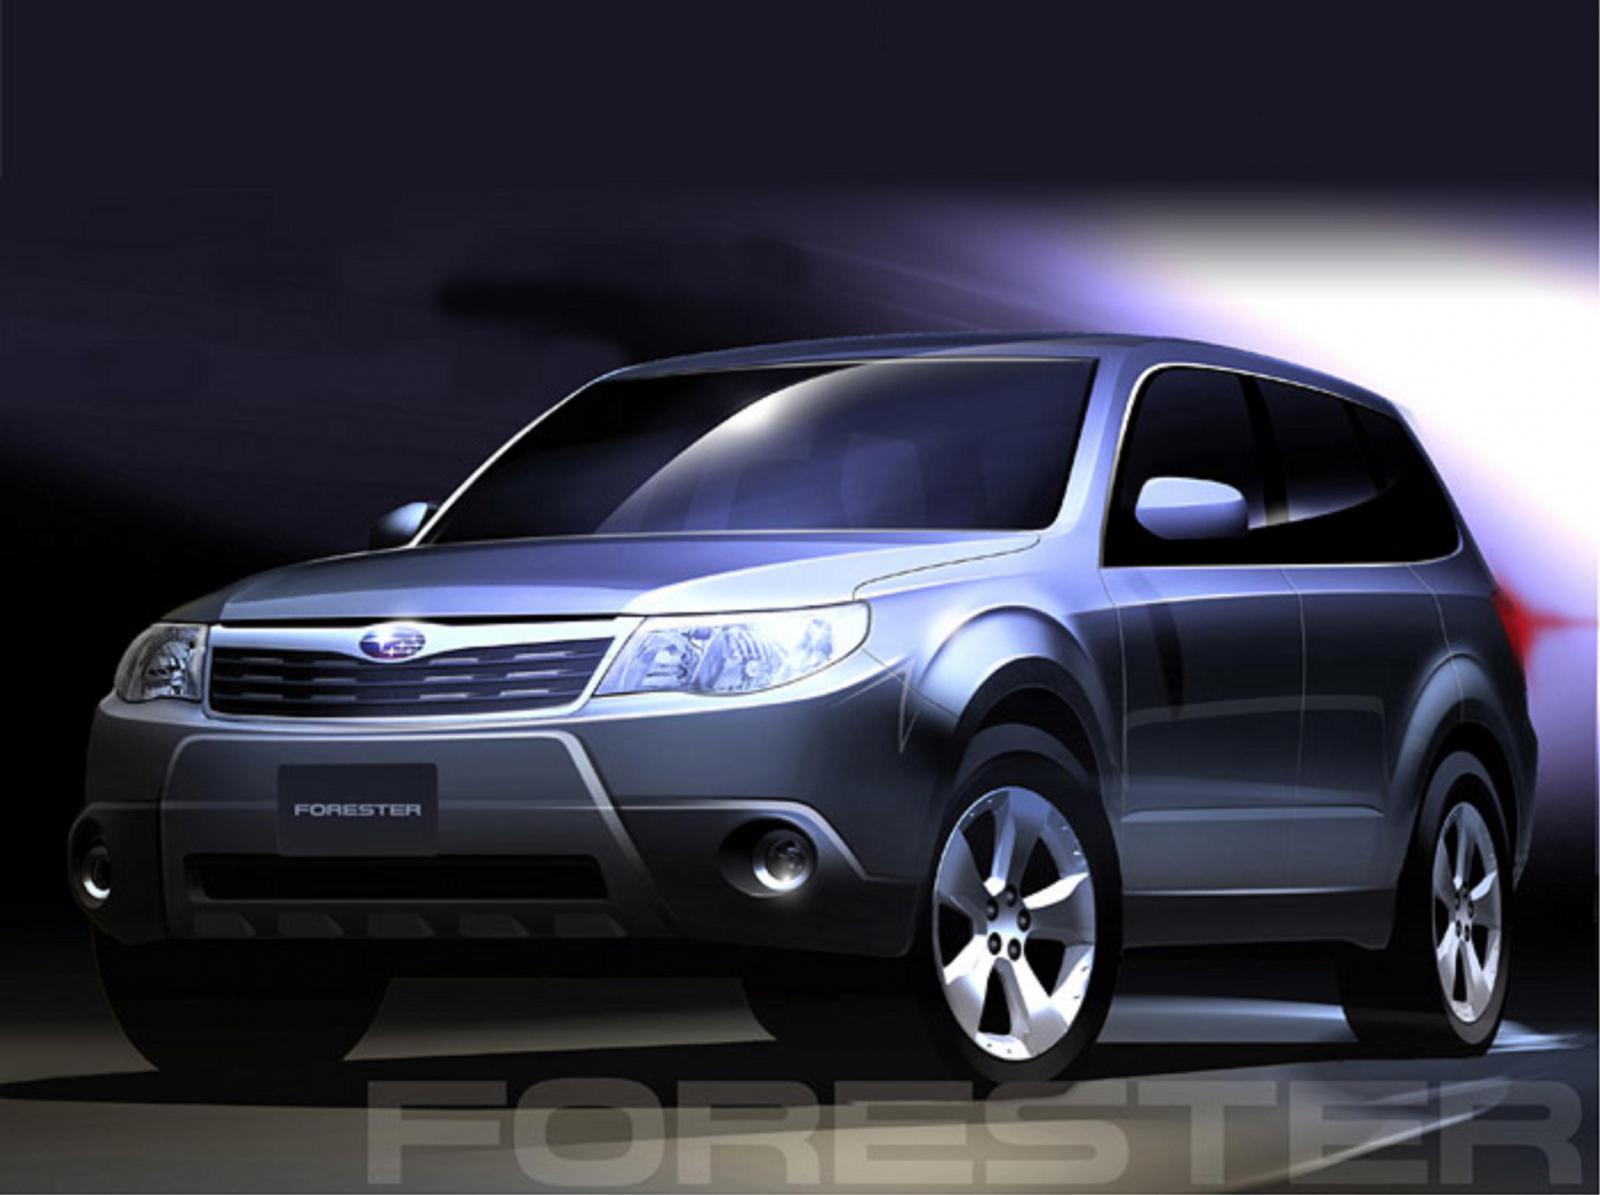 Car detail Subaru Forester 2 0 122 cui b4